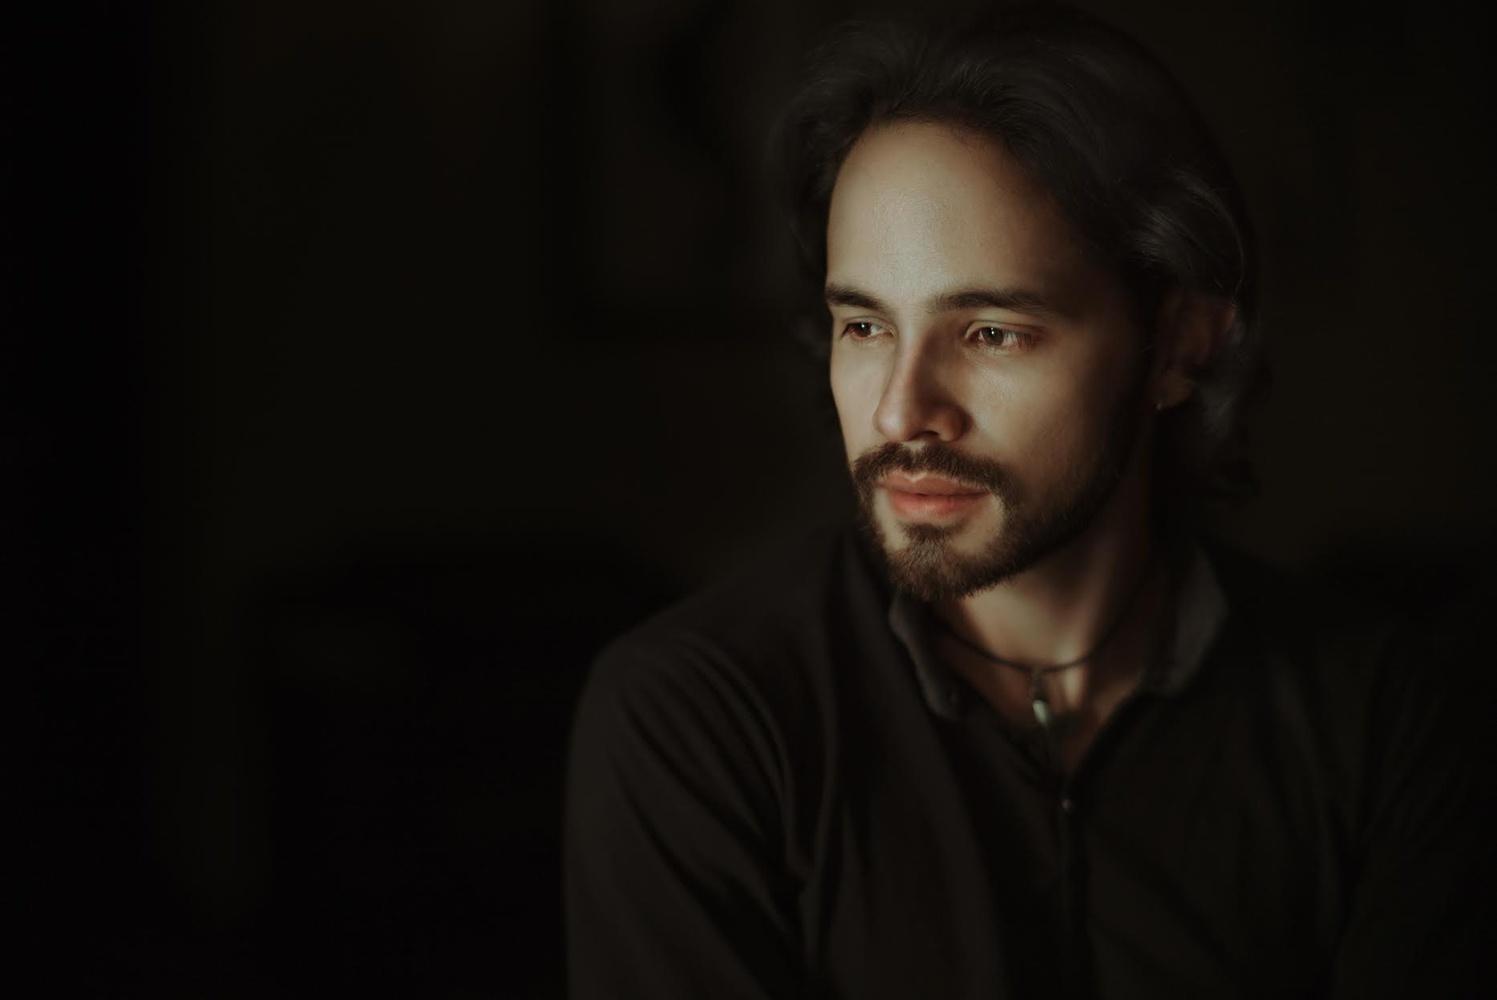 Rembrant Portrait by Misrai Sierra